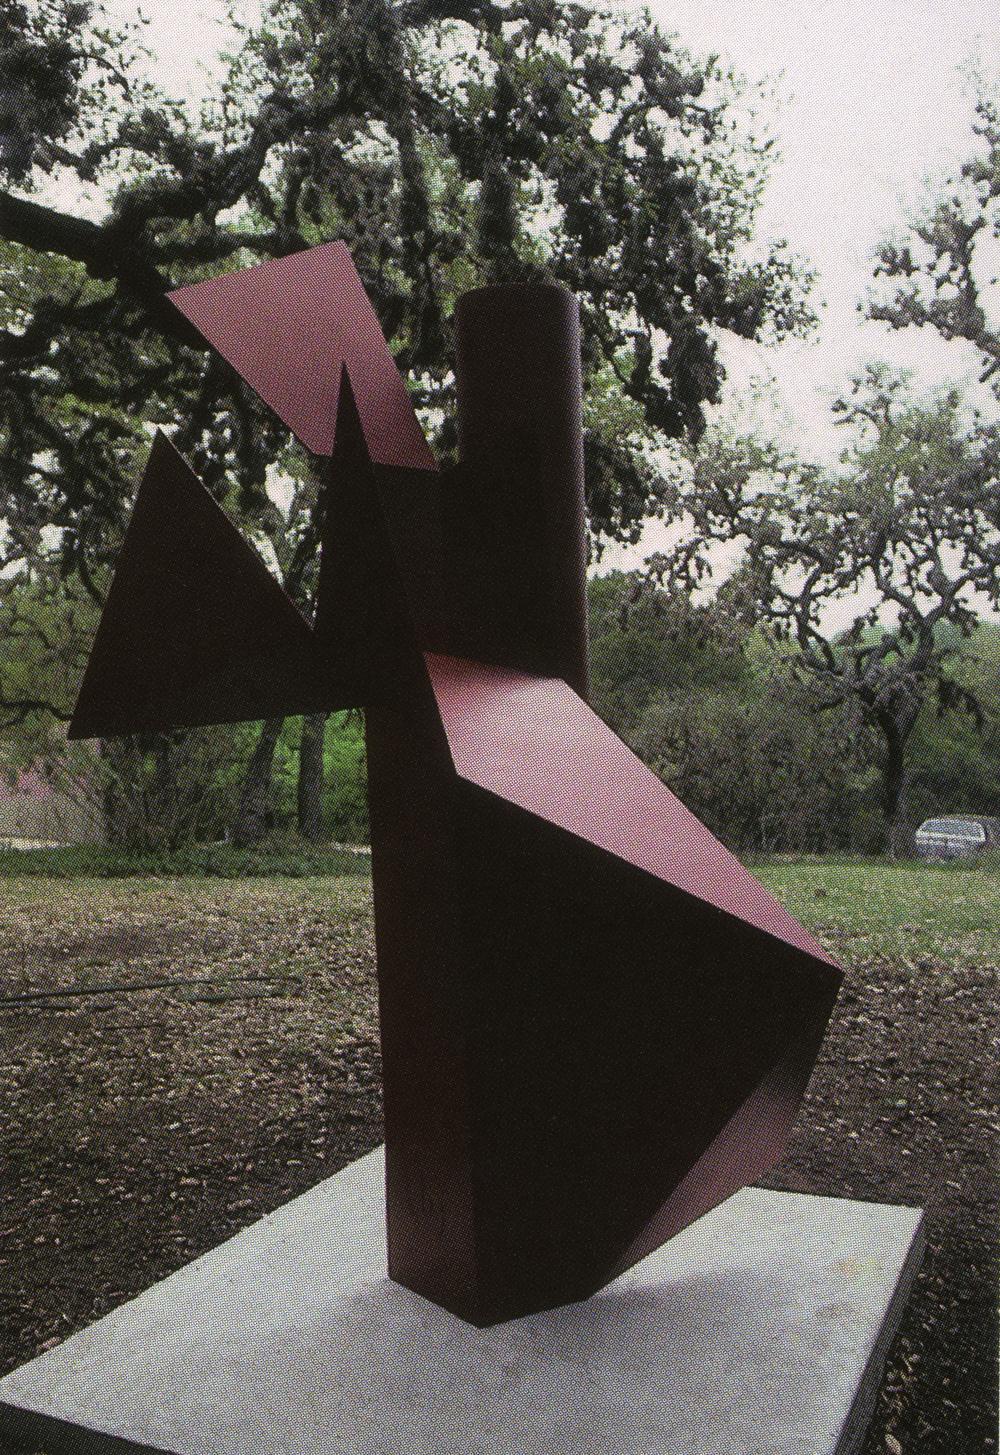 Austin Art Museum, Austin, Texas; 1996.  Atlas III.  7' x 4' x 5'.